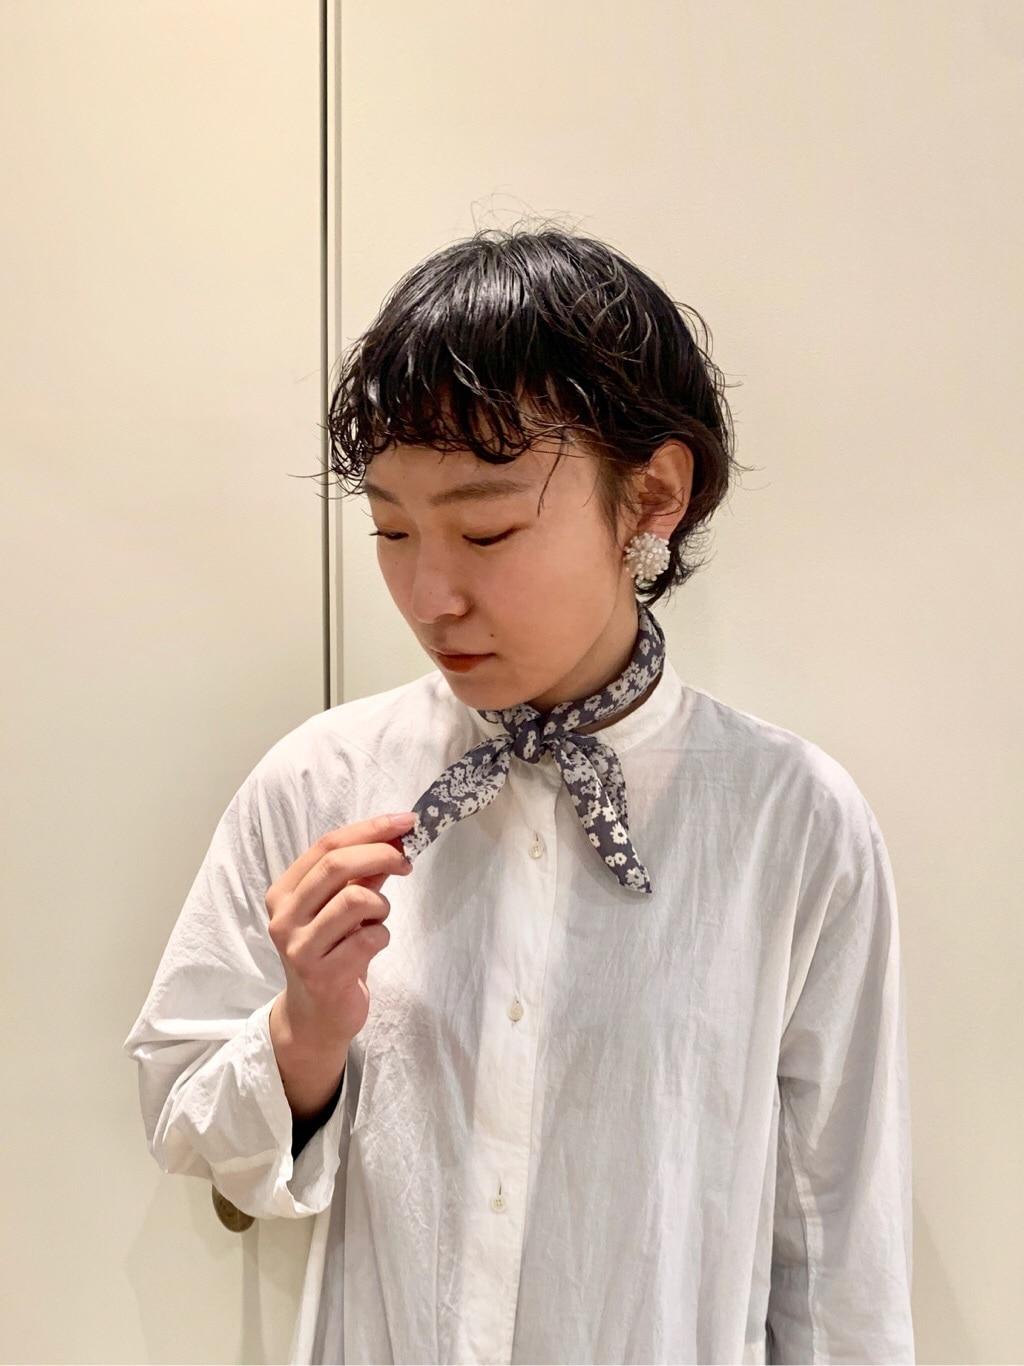 bulle de savon 新宿ミロード 身長:159cm 2020.03.12